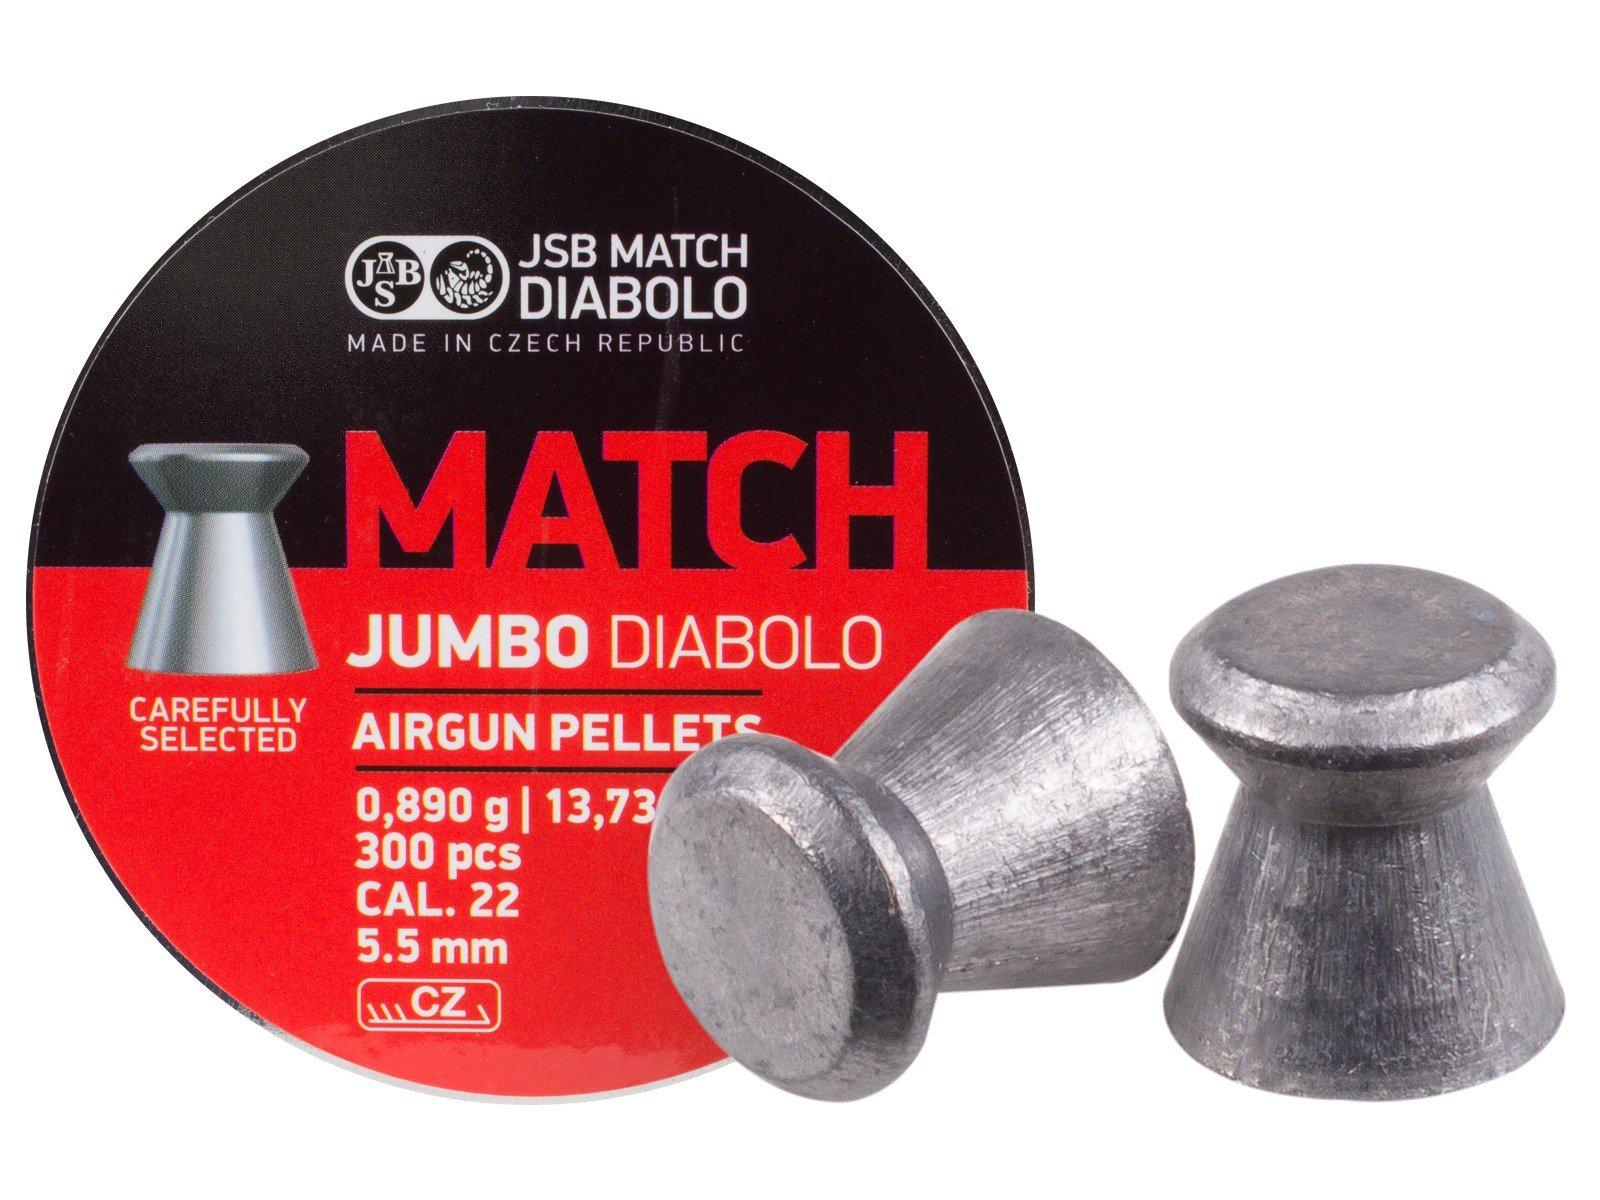 JSB Match Jumbo Diabolo Pellets.22 Cal, 13.73 Grains, Wadcutter, 300ct